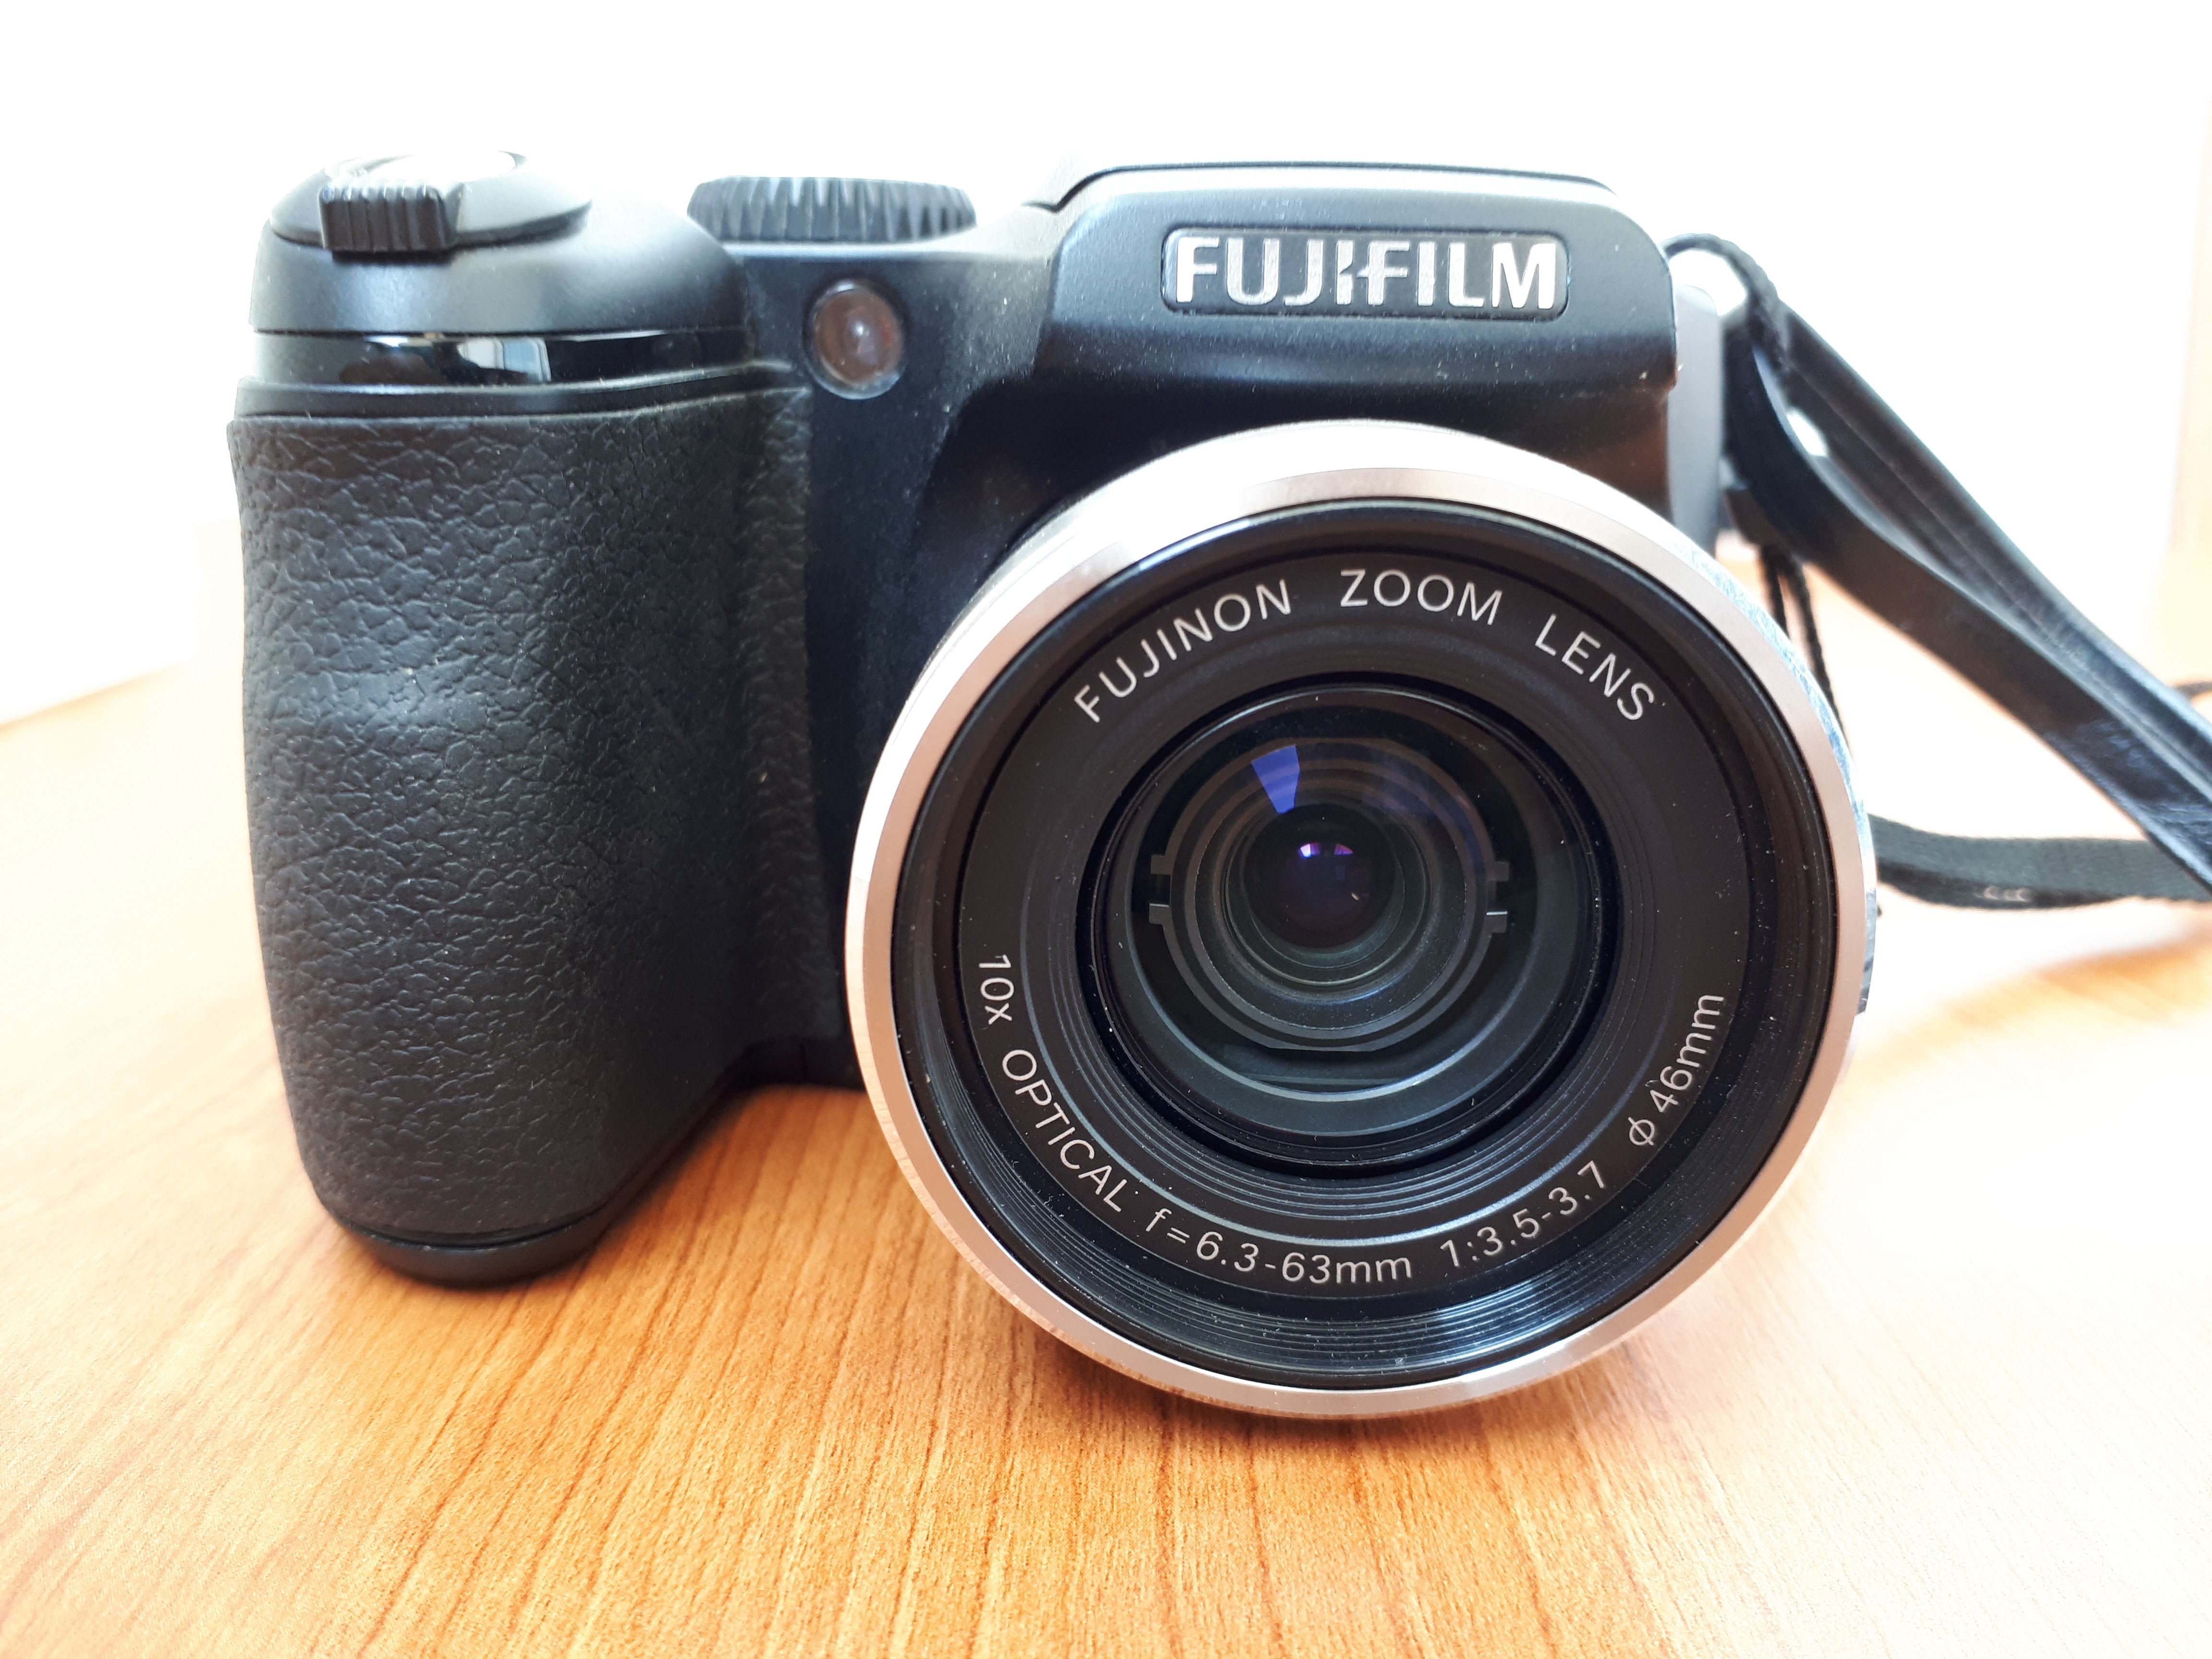 file fujifilm finepix s5800 c jpg wikimedia commons rh commons wikimedia org Fujifilm FinePix Camera Manual Fujifilm FinePix Z90